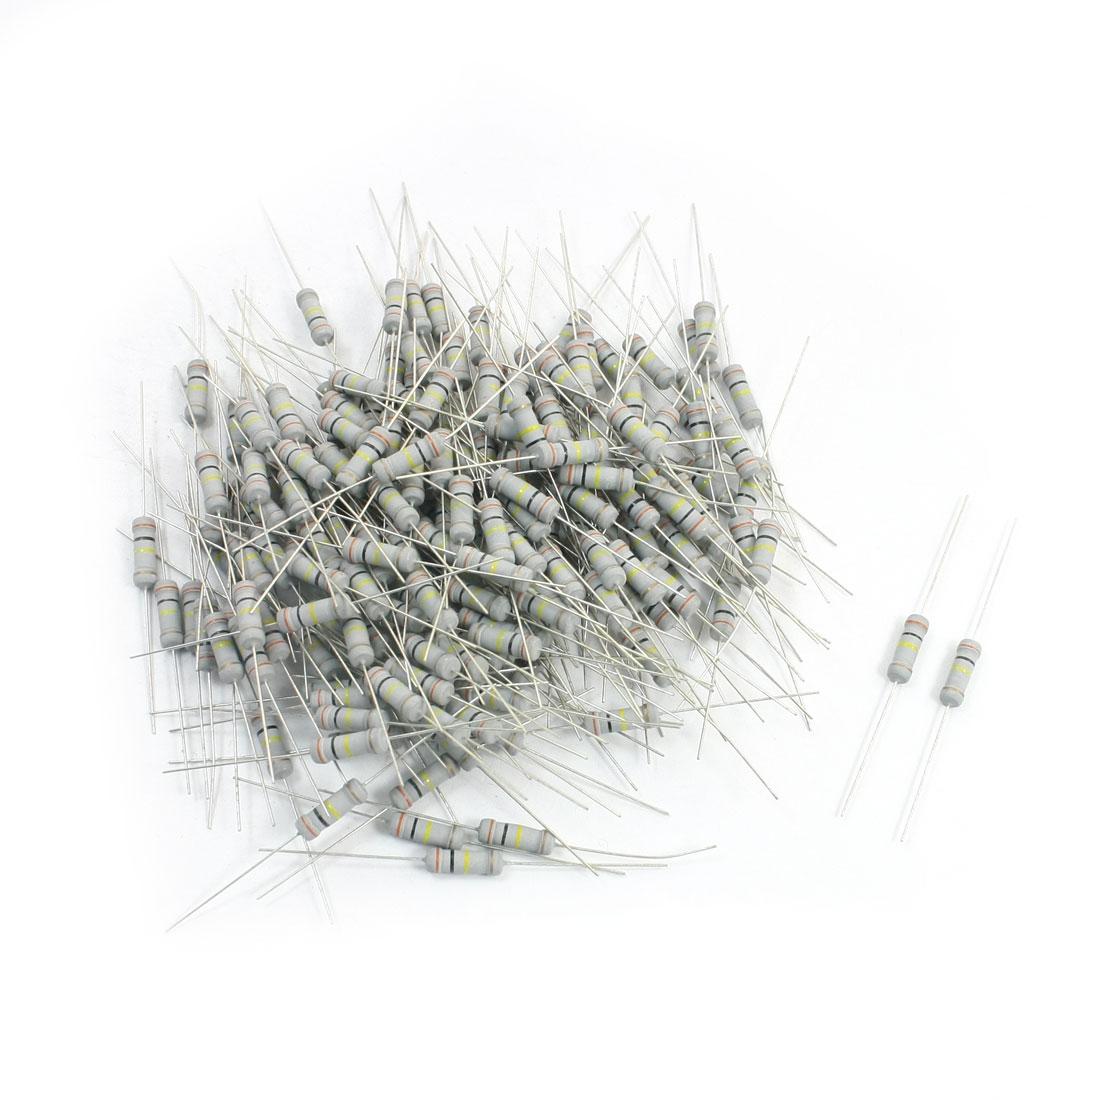 200Pcs 300K Ohm 1W 5% Axial Leads Metal Oxide Film Resistor Resistance